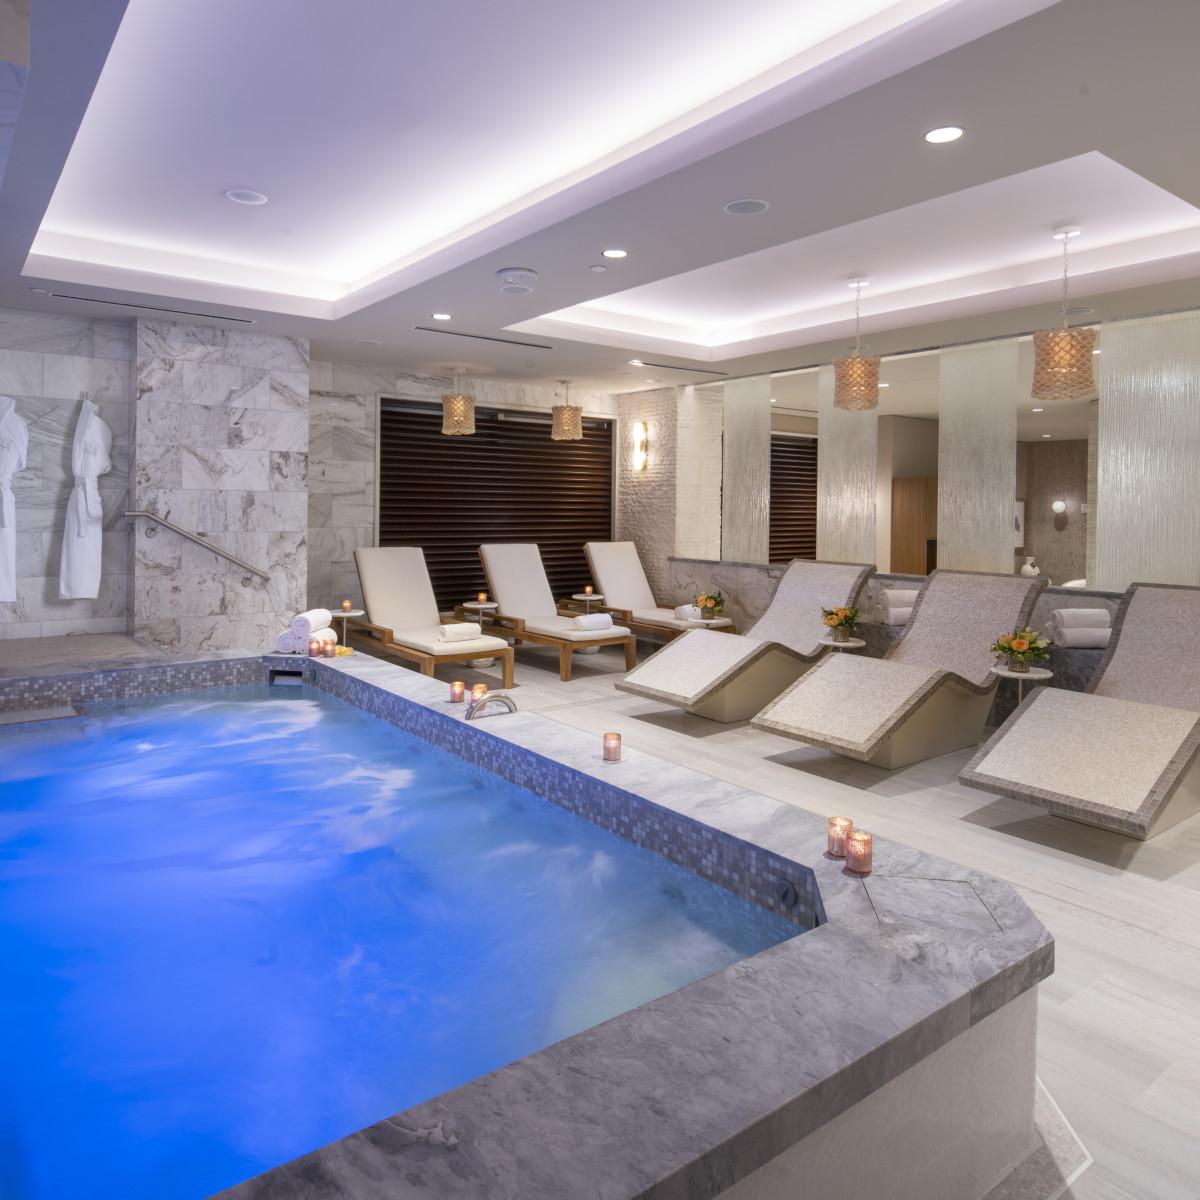 The Post Oak Hotel spa